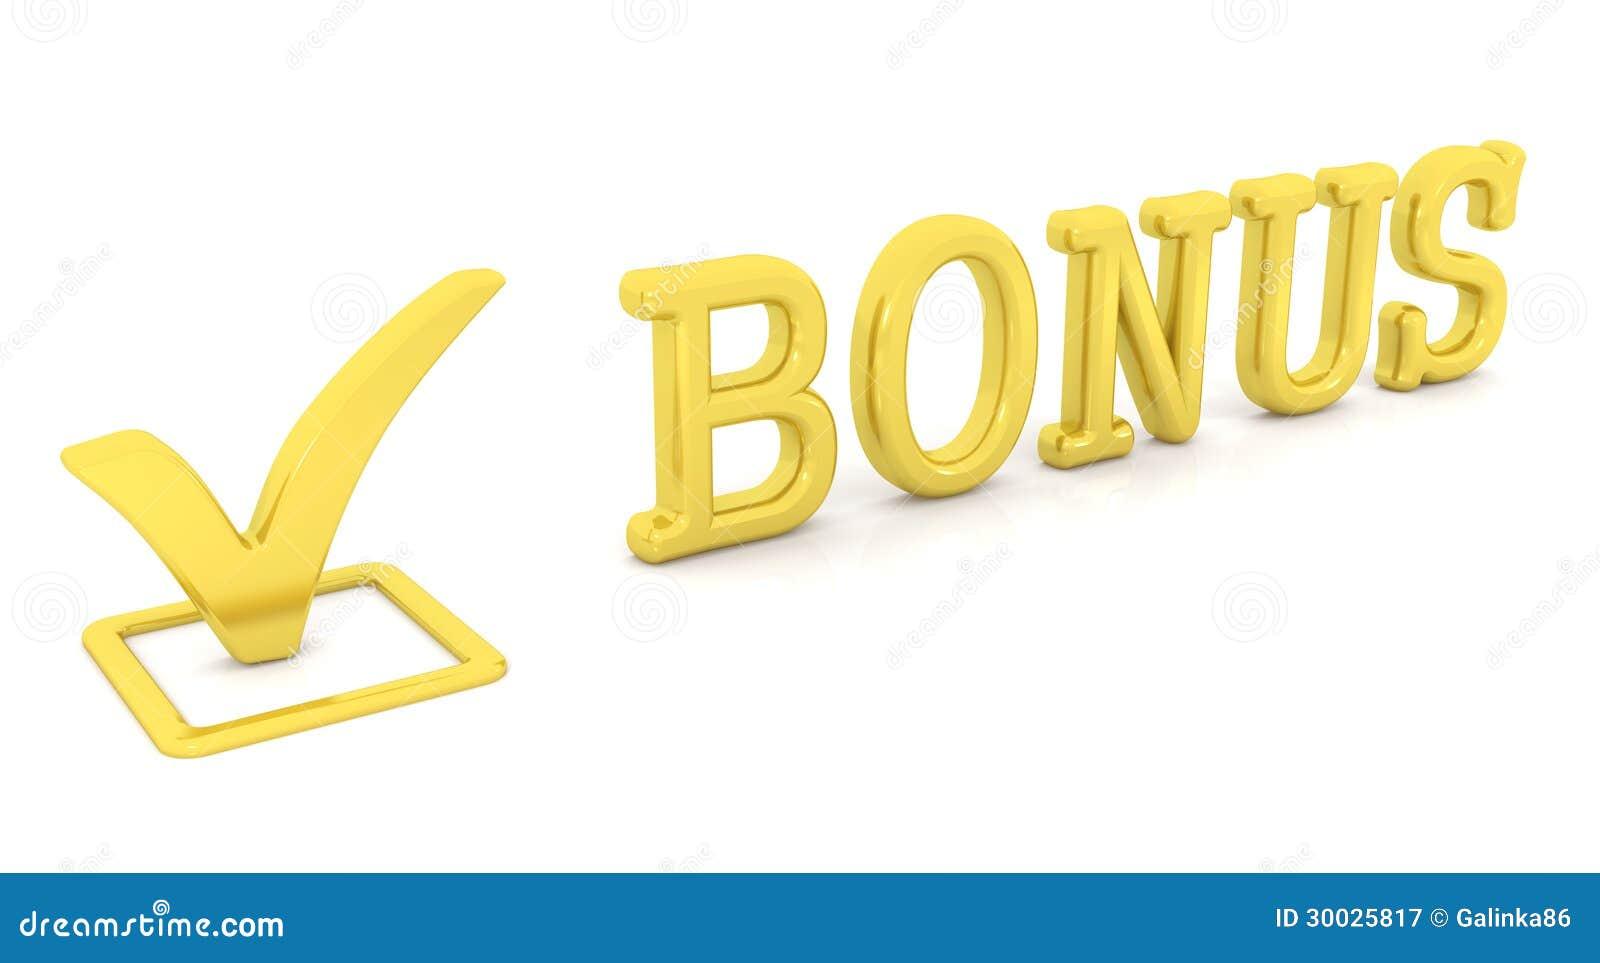 No Credit Check Credit Cards >> Check Mark Royalty Free Stock Photography - Image: 30025817